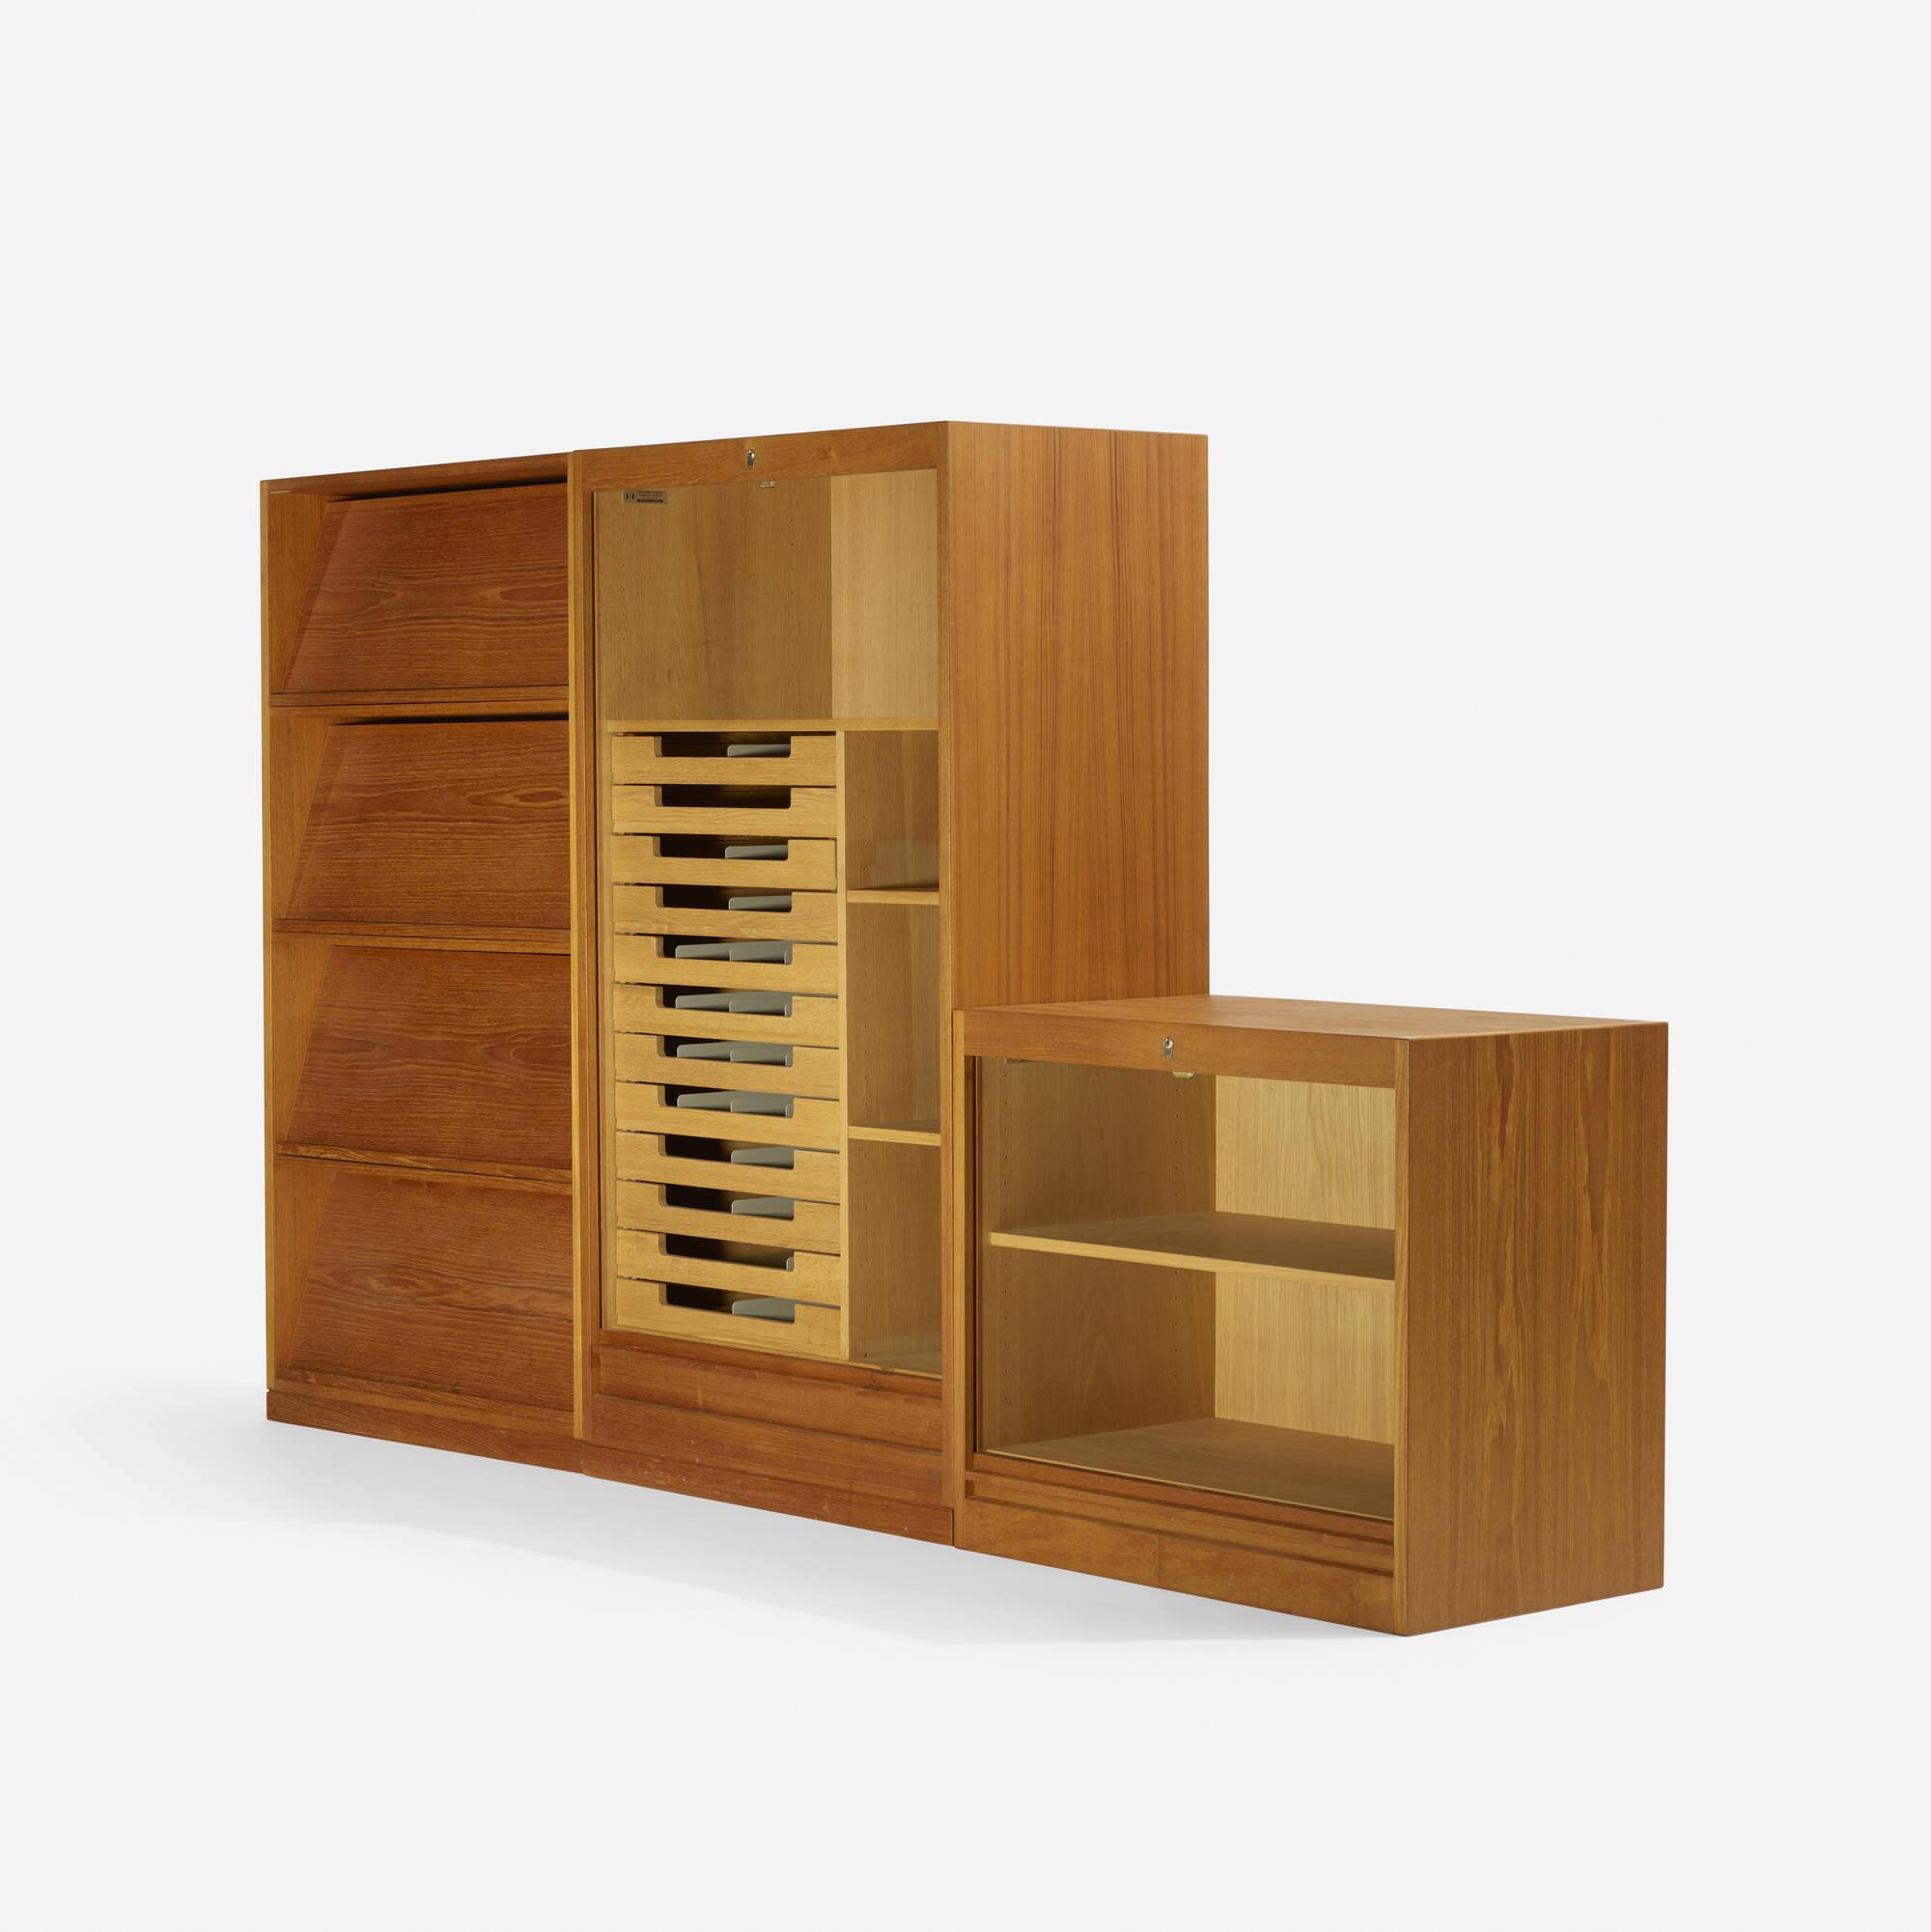 336: Hans J. Wegner / storage system (2 of 4)